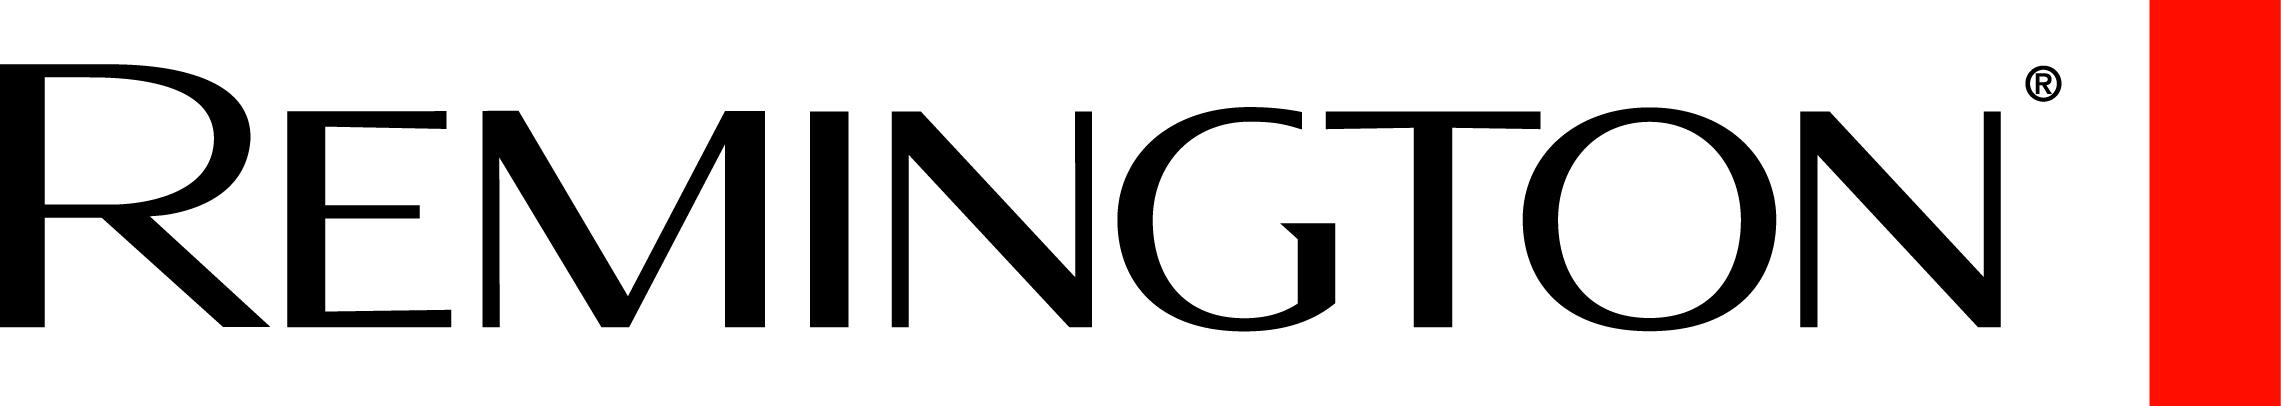 Go Back Images For Remington Logo Wallpaper 2281x406